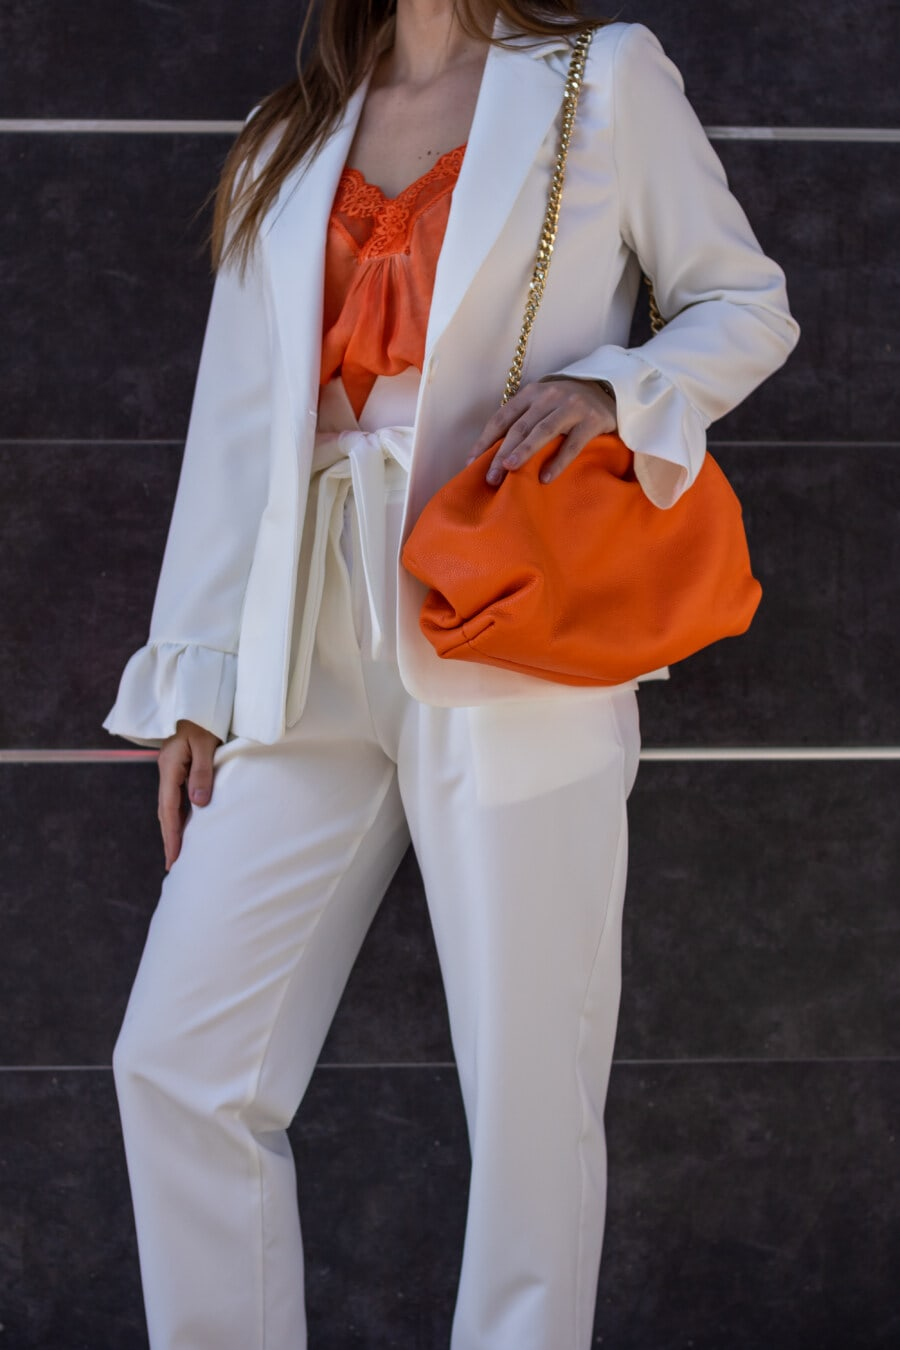 elegant, fancy, white, businesswoman, outerwear, coat, pants, orange yellow, handbag, woman